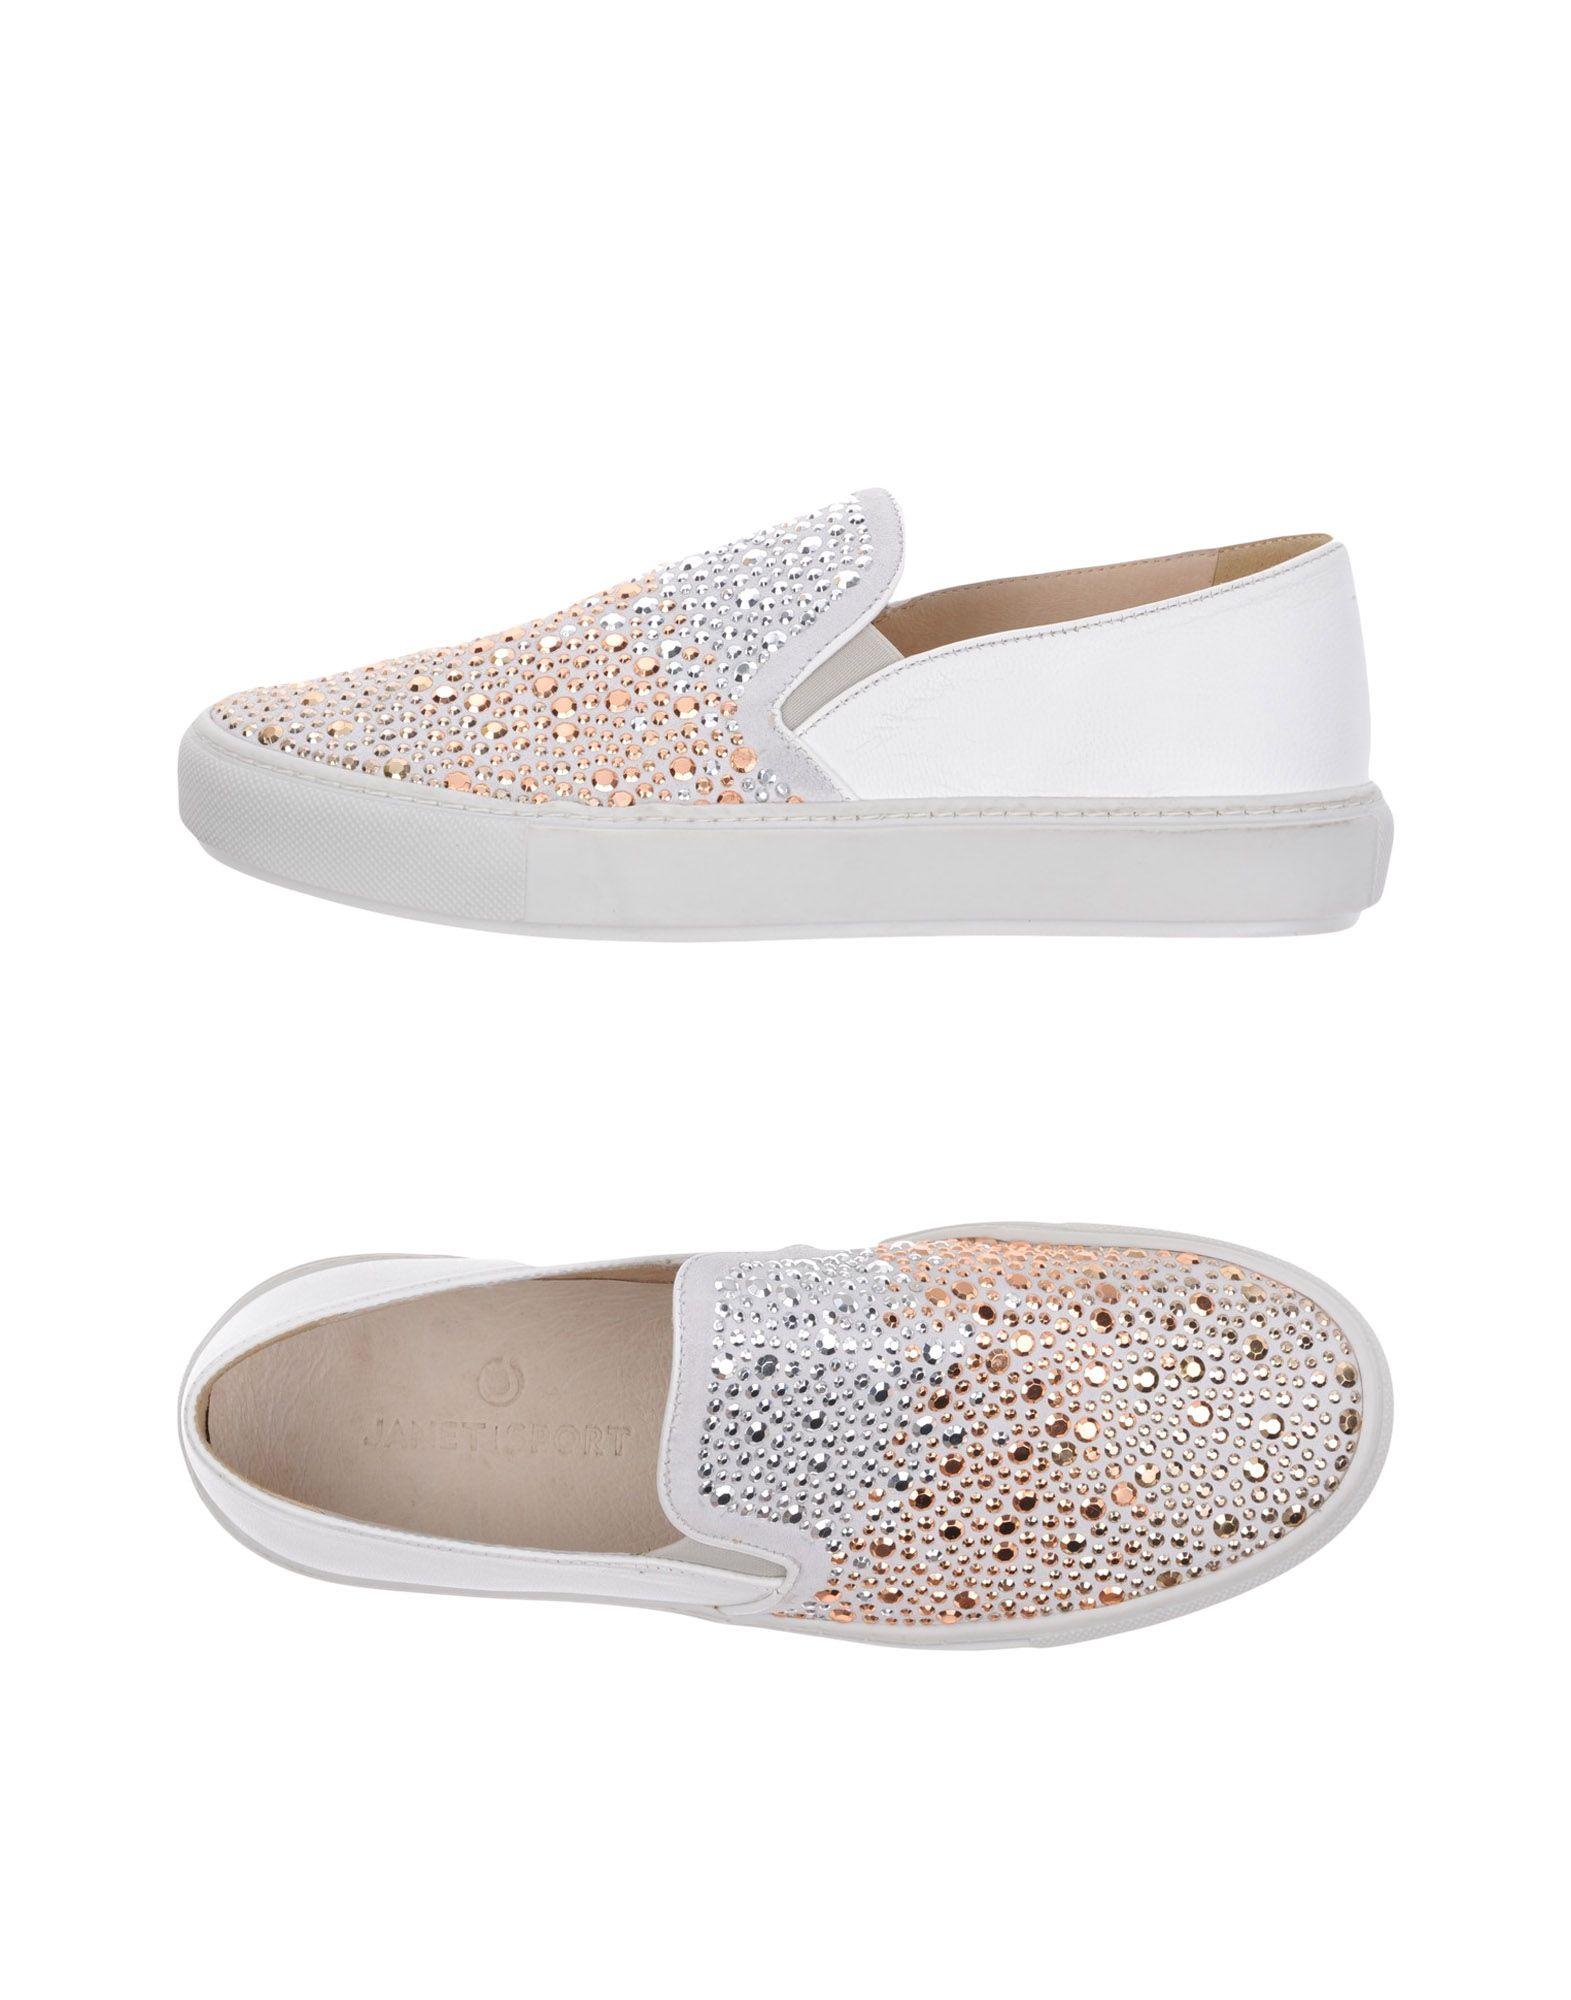 Janet Sport Sneakers Damen  11287972IK 11287972IK  Gute Qualität beliebte Schuhe 61cb39